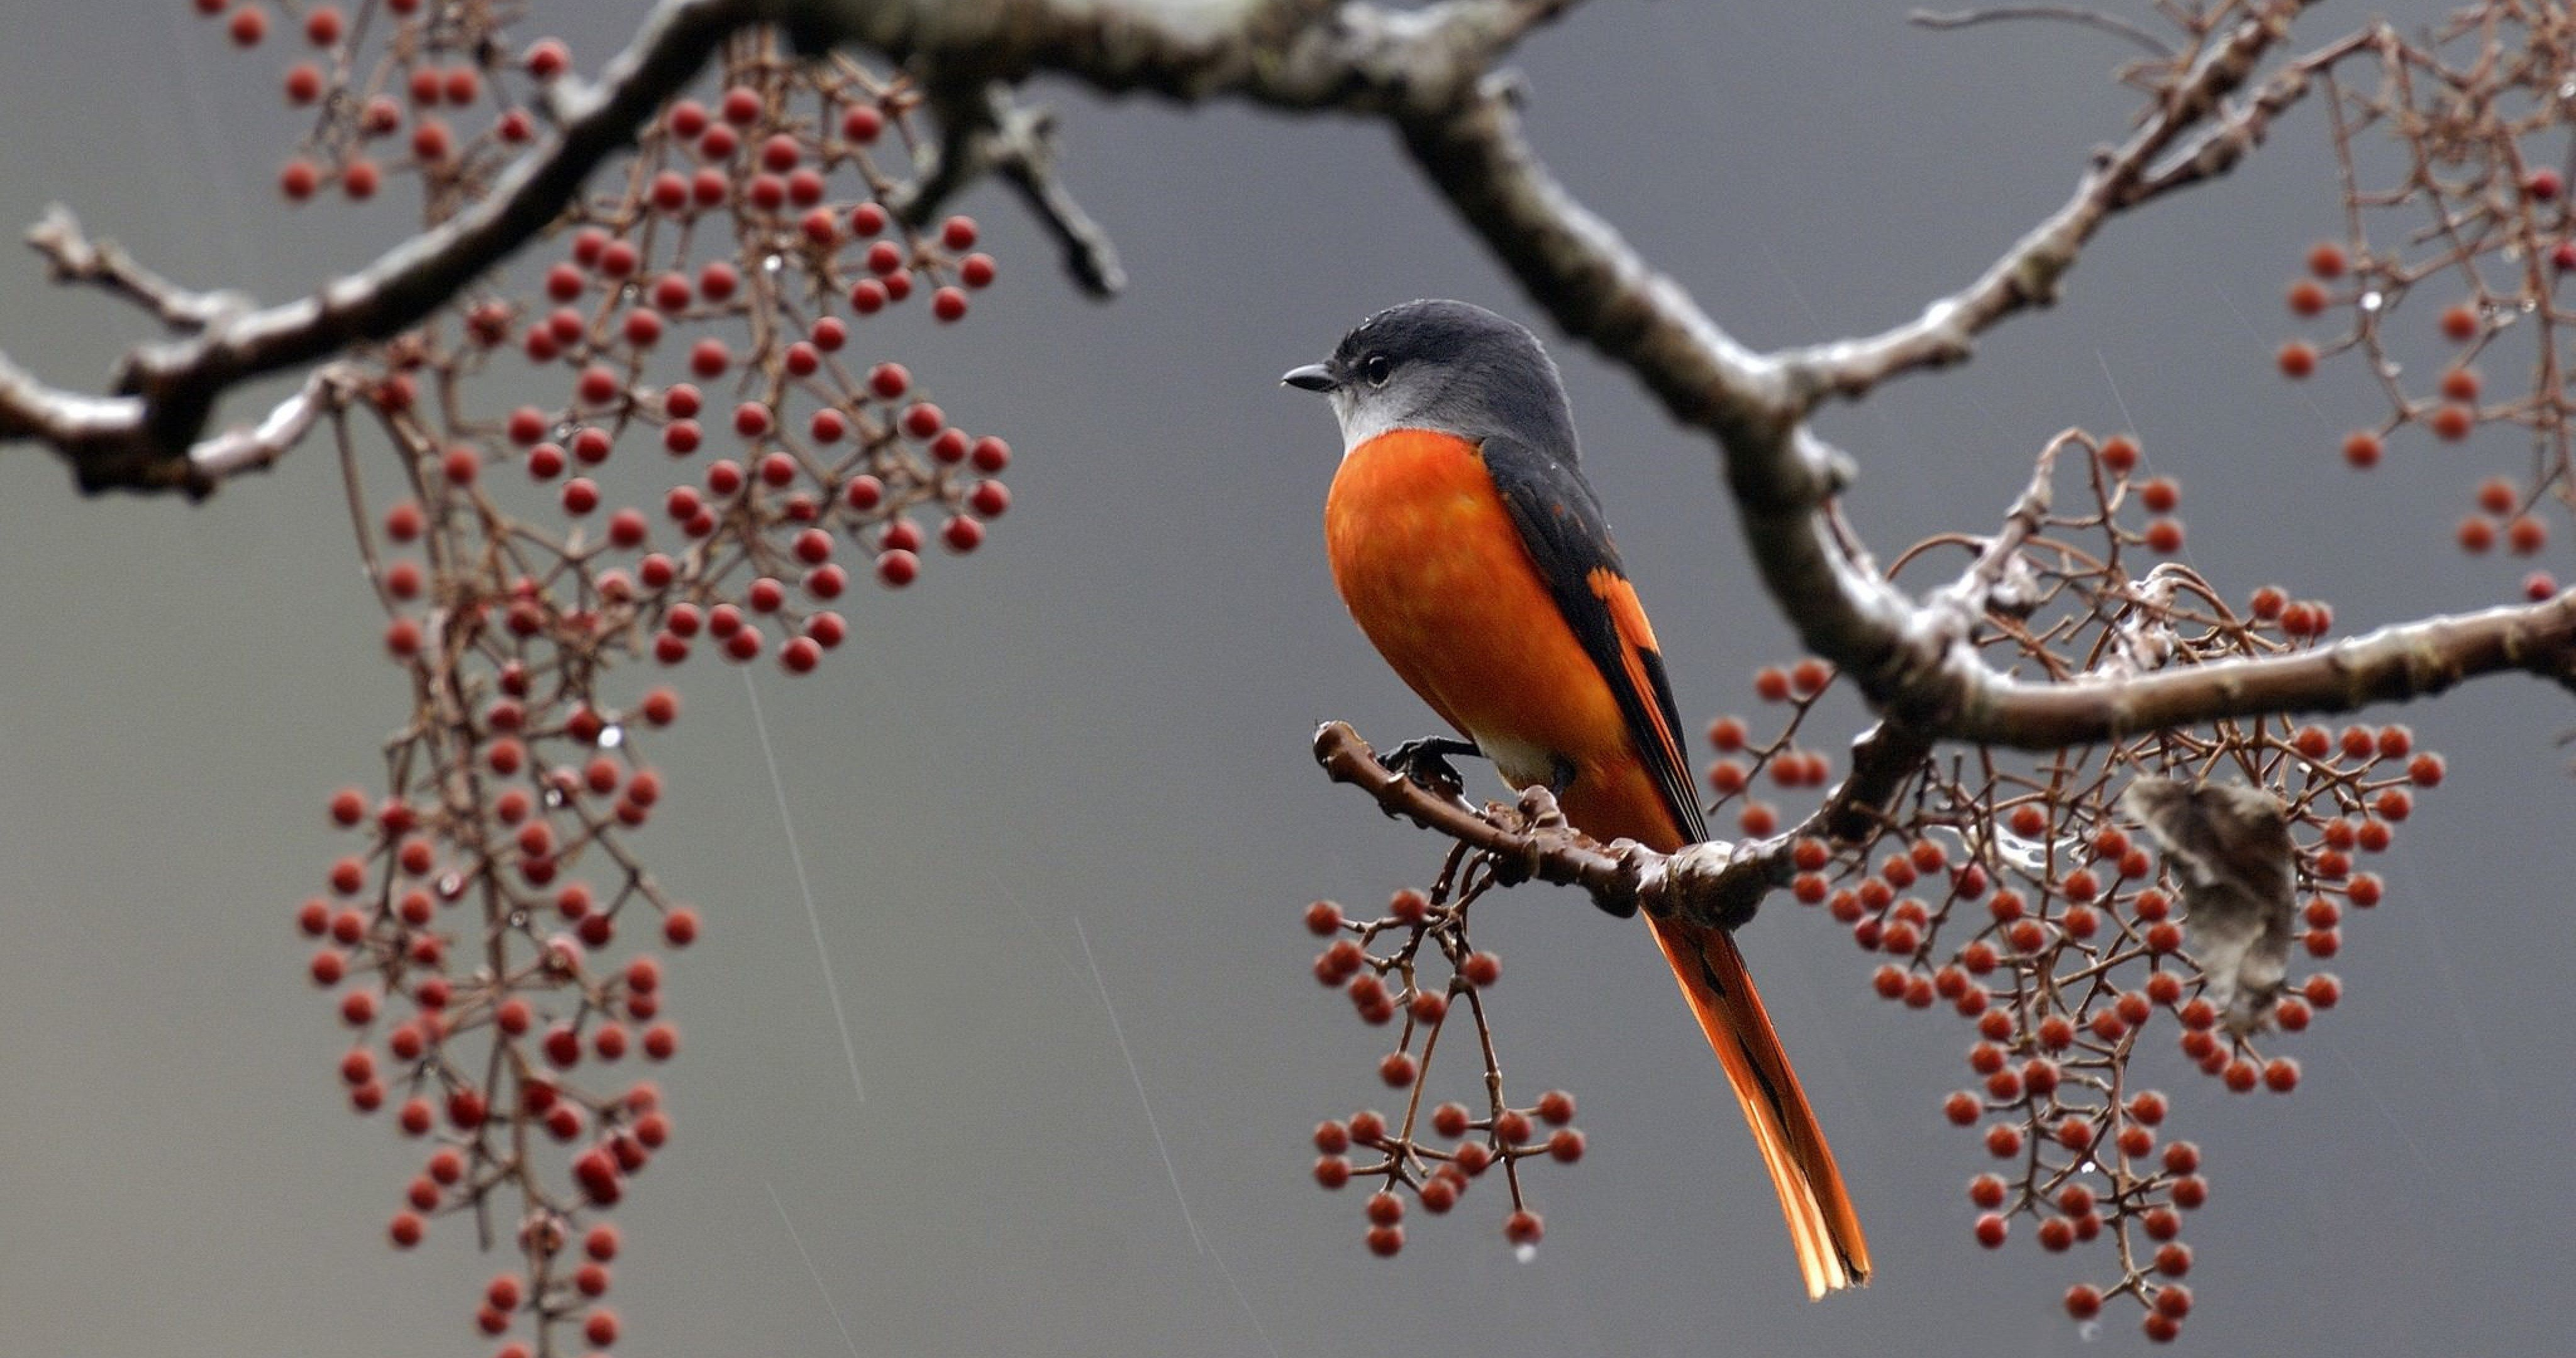 Bird On Branch With Barries 4k Ultra Hd Wallpaper Beautiful Birds Bird Bird On Branch